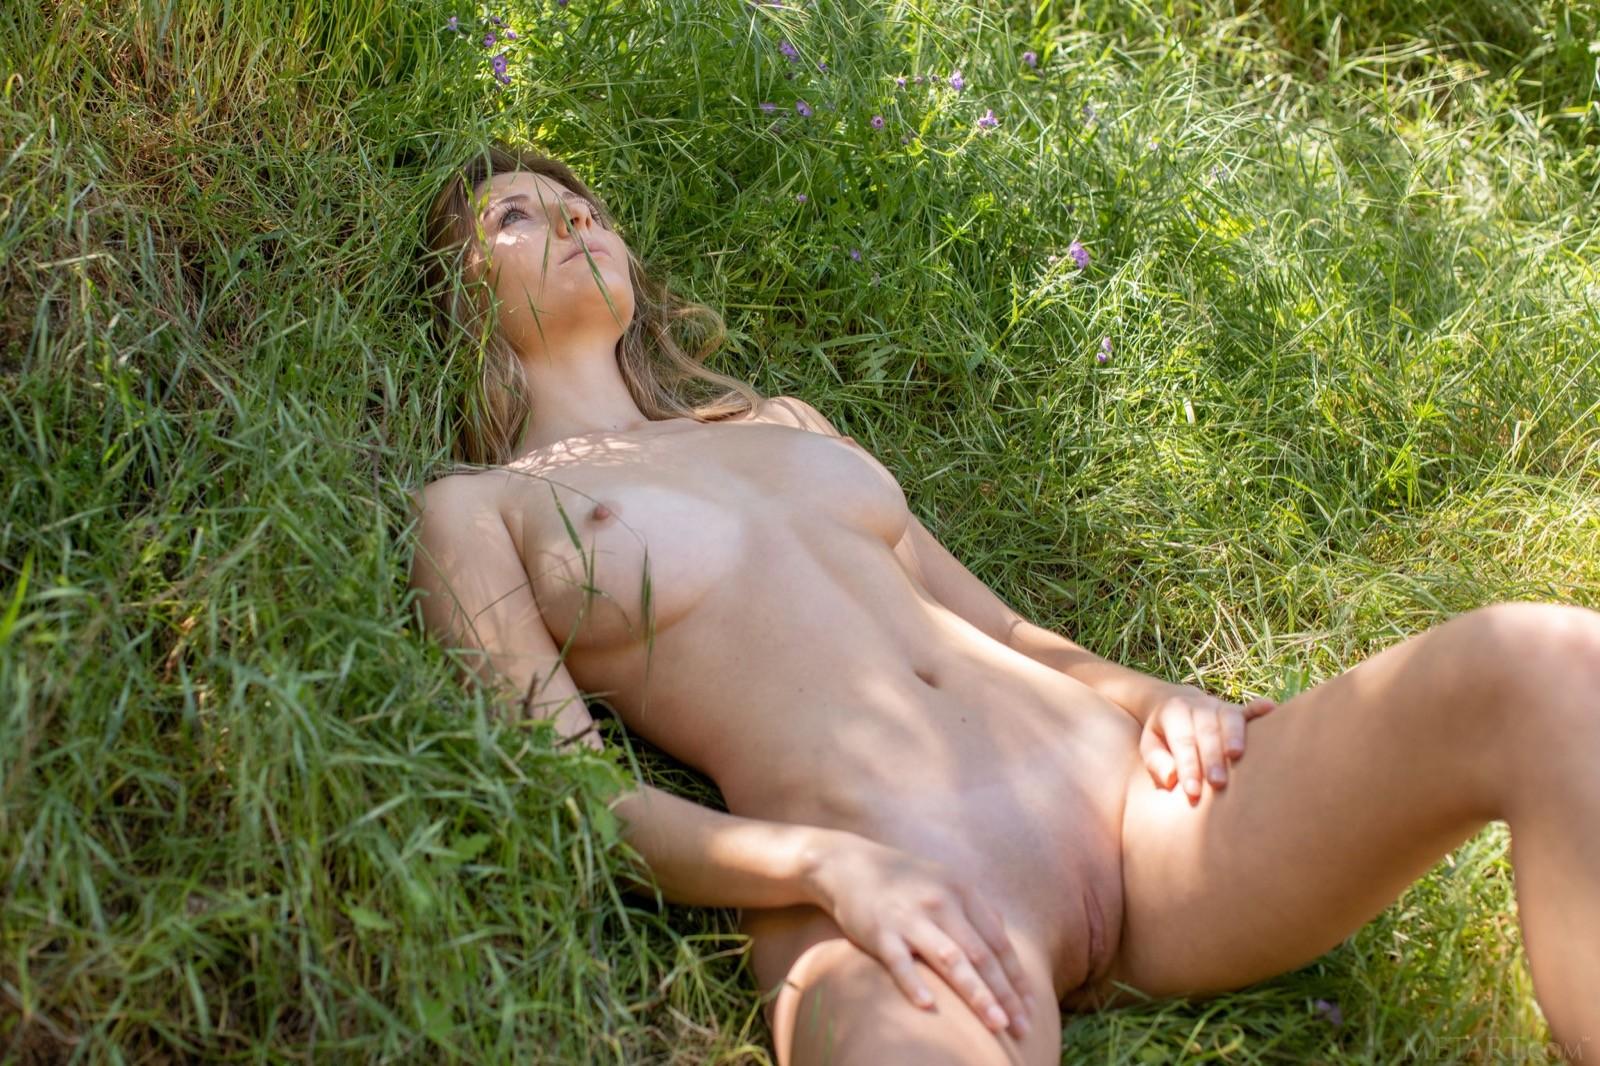 Девушка с большими титьками на природе - фото